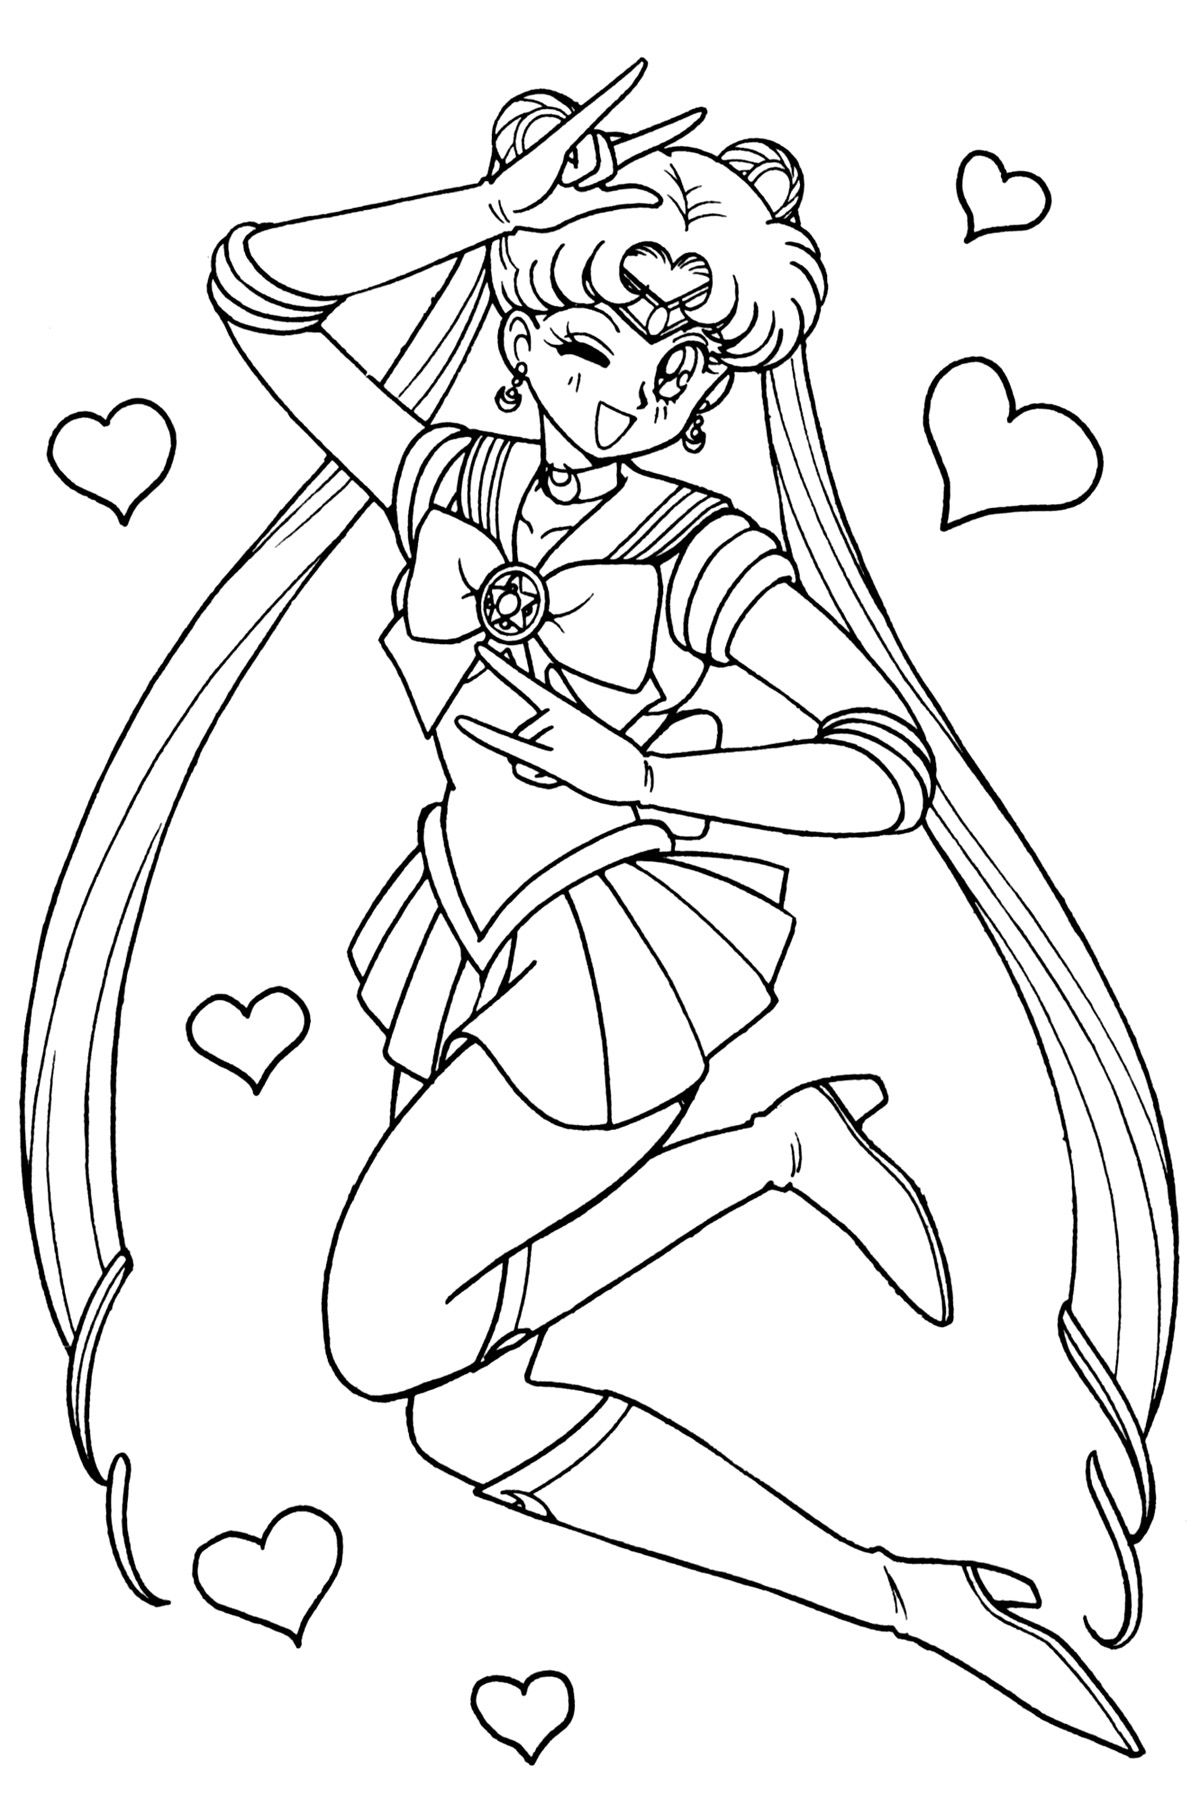 Moon265 Jpg 1200 1816 Sailor Moon Coloring Pages Sailor Moon Art Sailor Moon Wallpaper